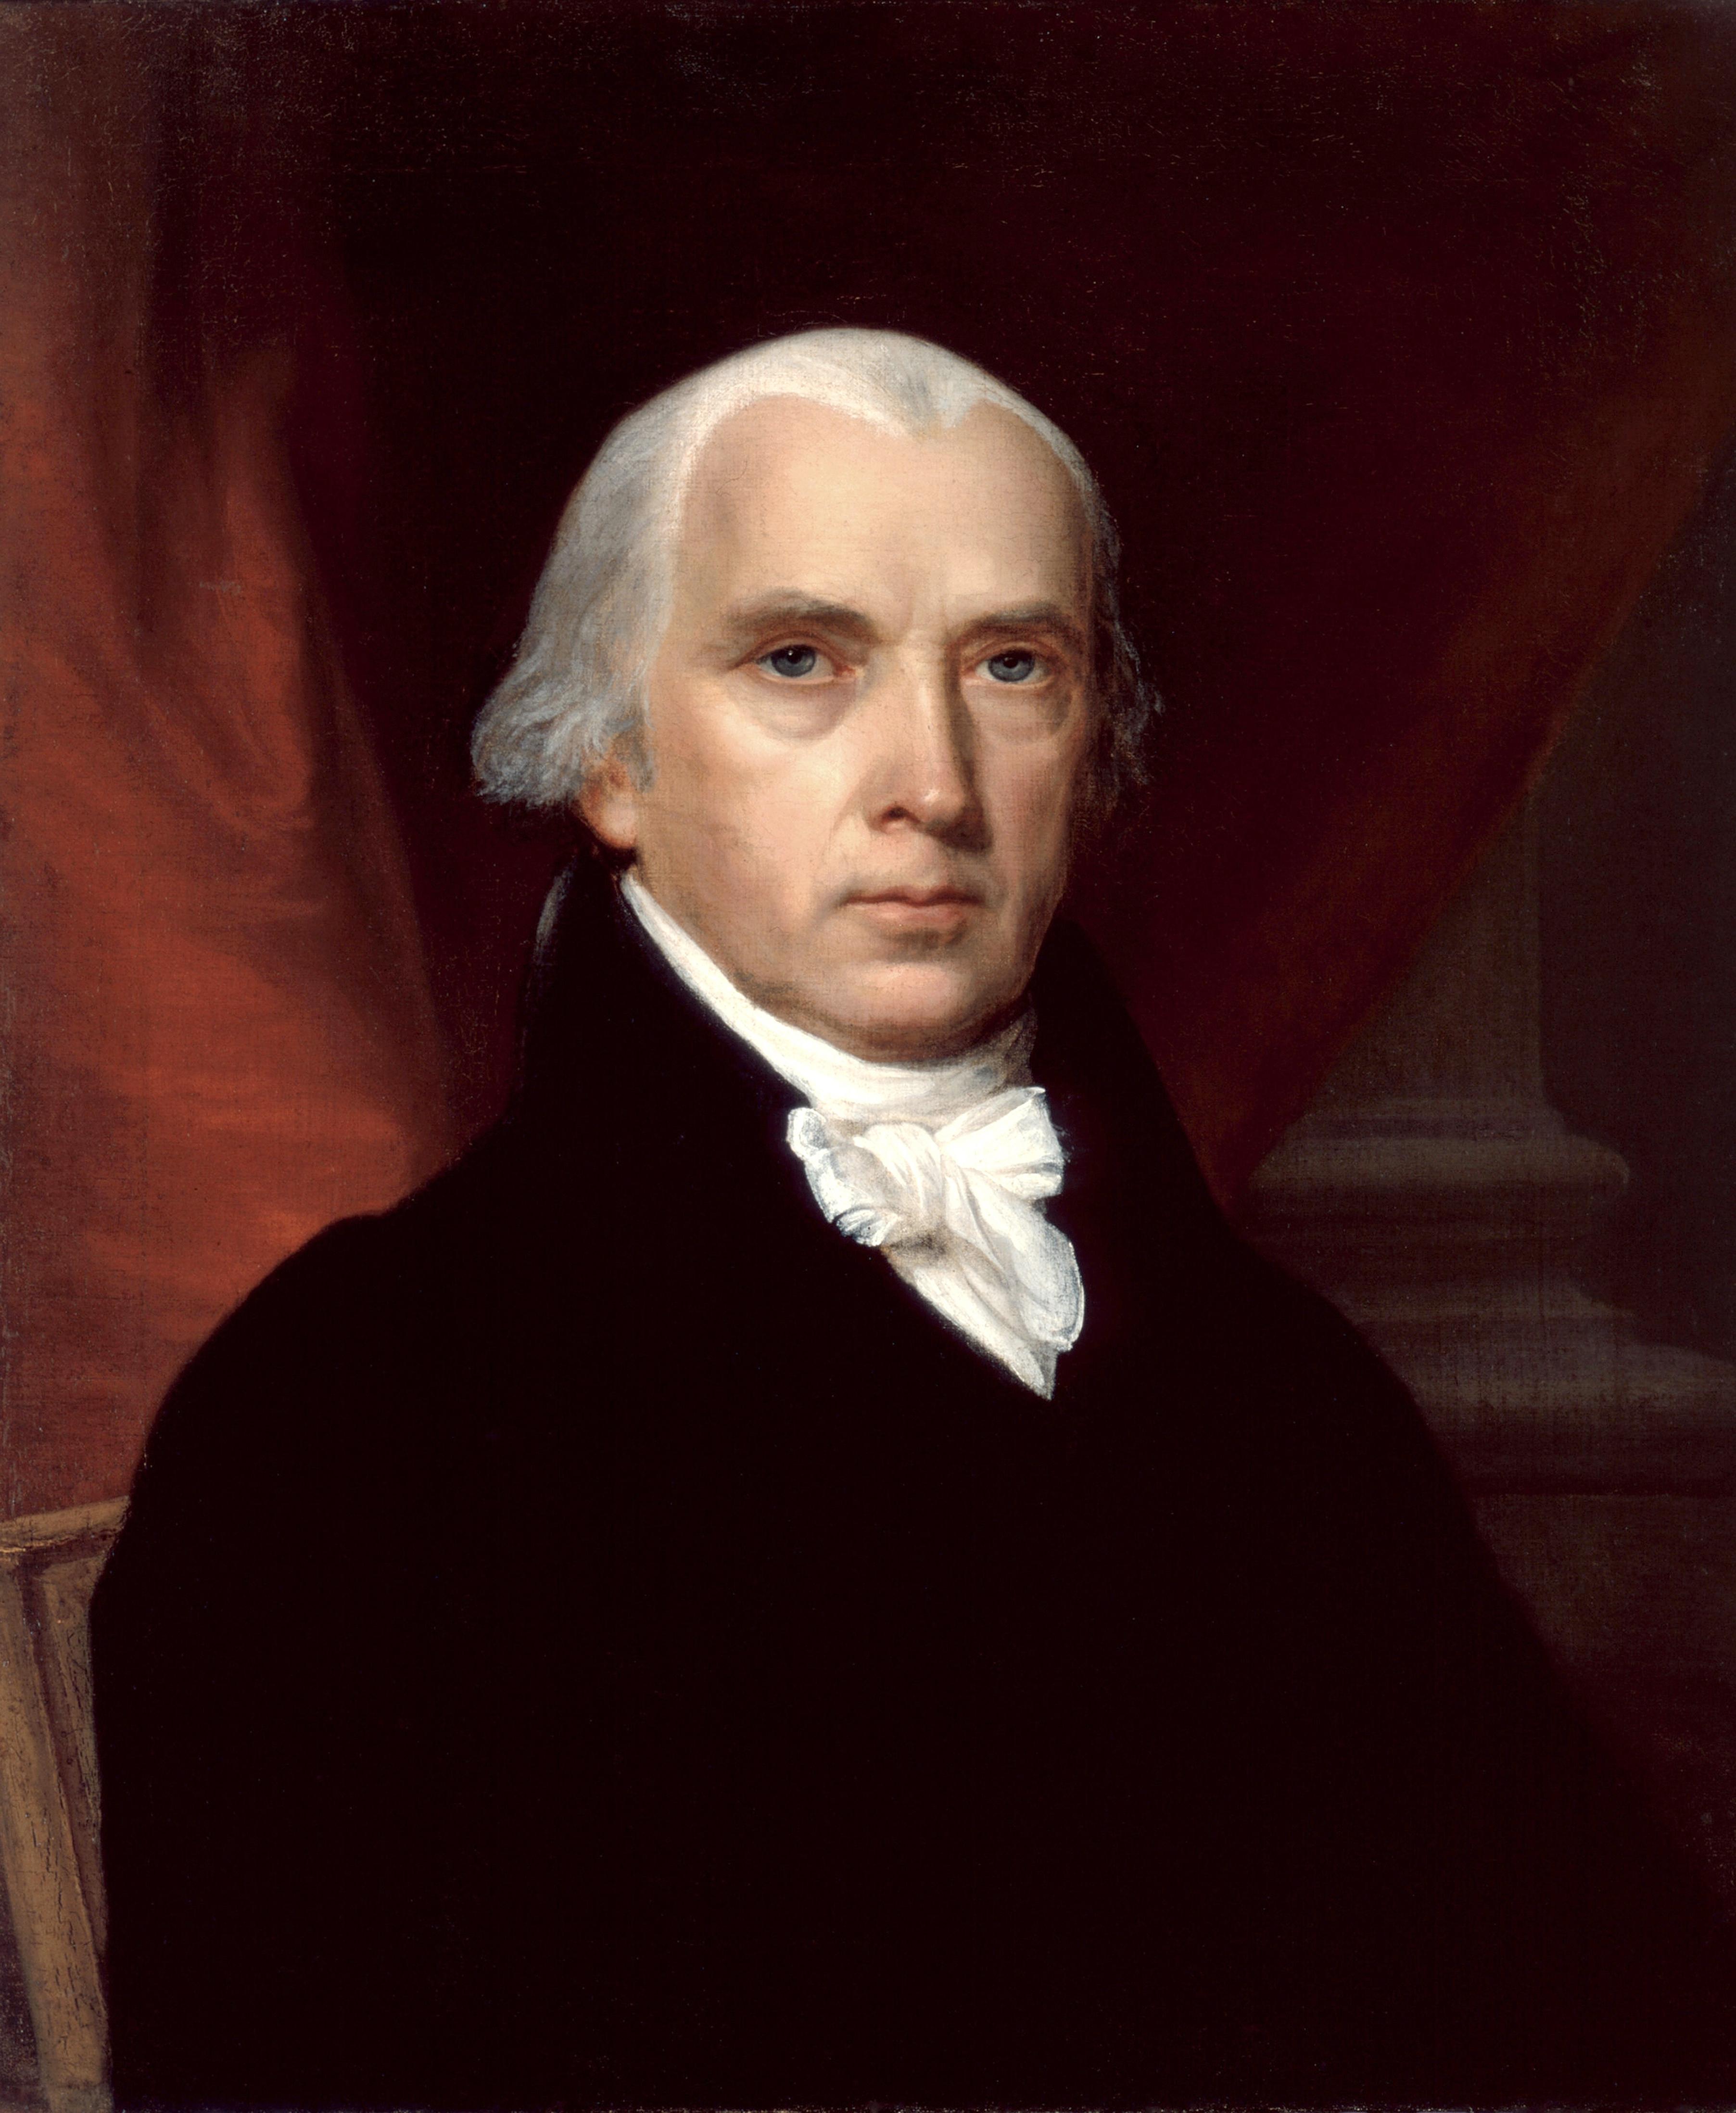 Portrait of James Madison.